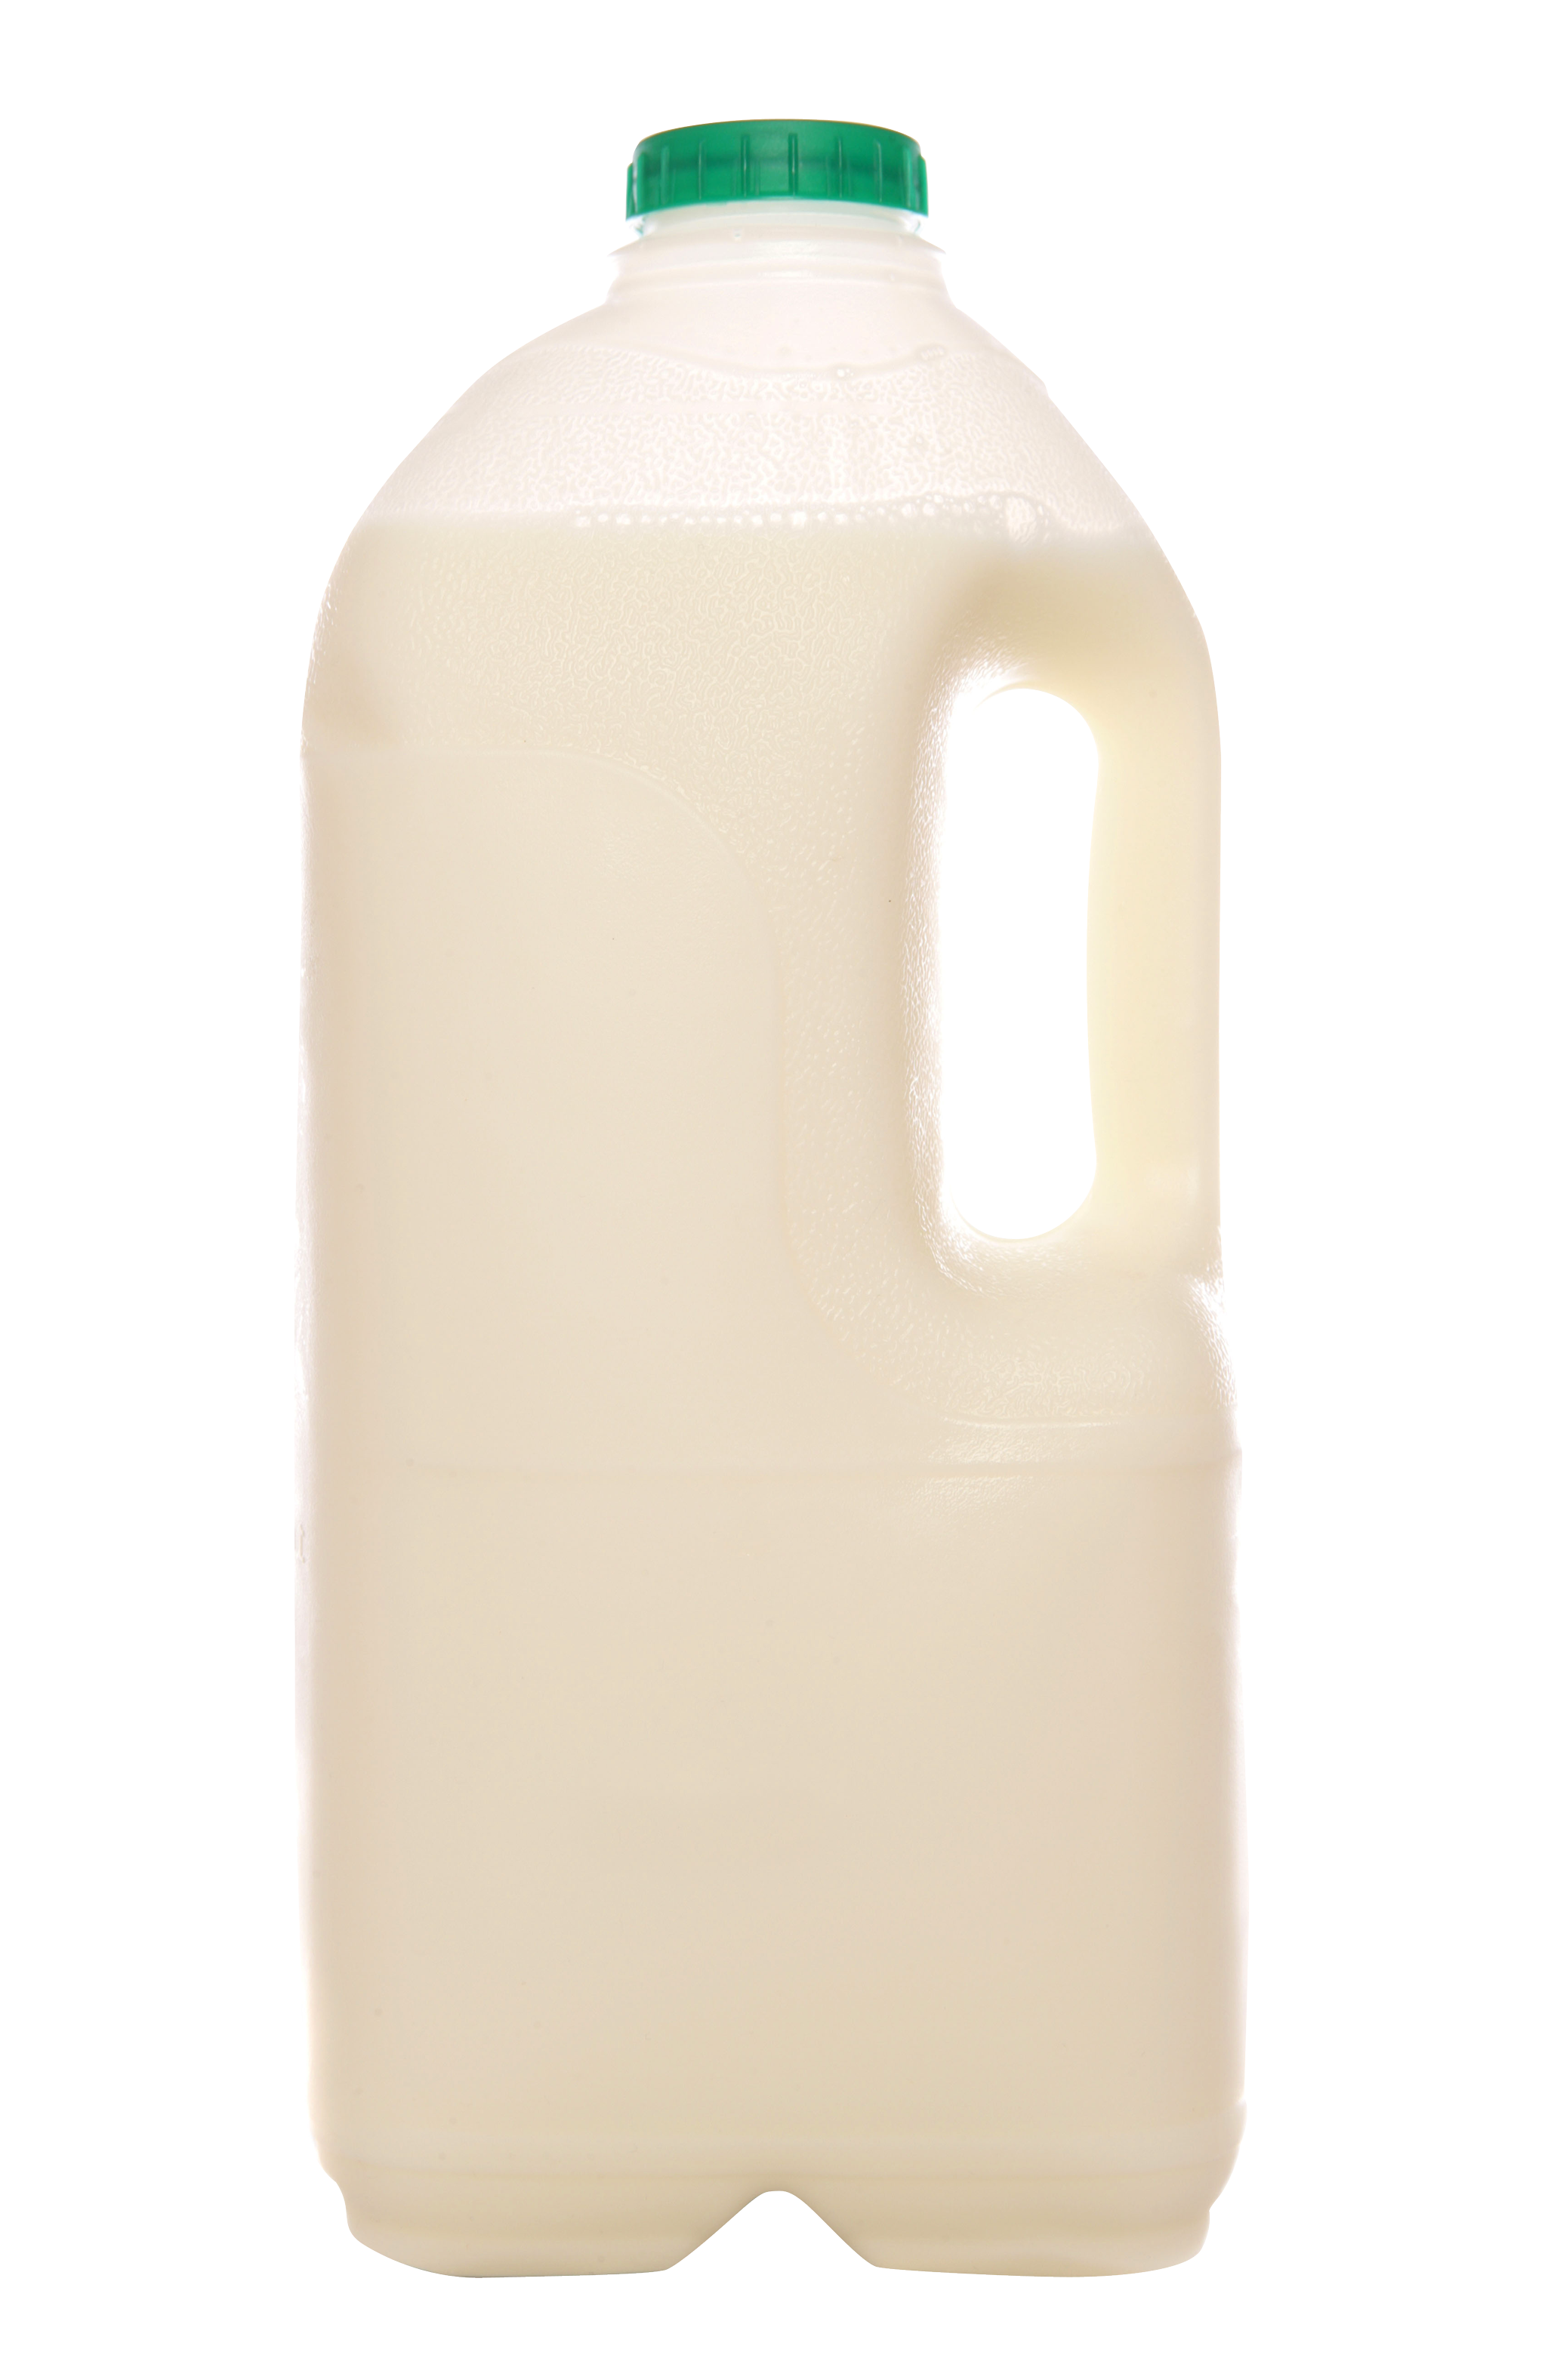 Milk PNG Images, Milk Jar, Milk Carton Free Clipart ...